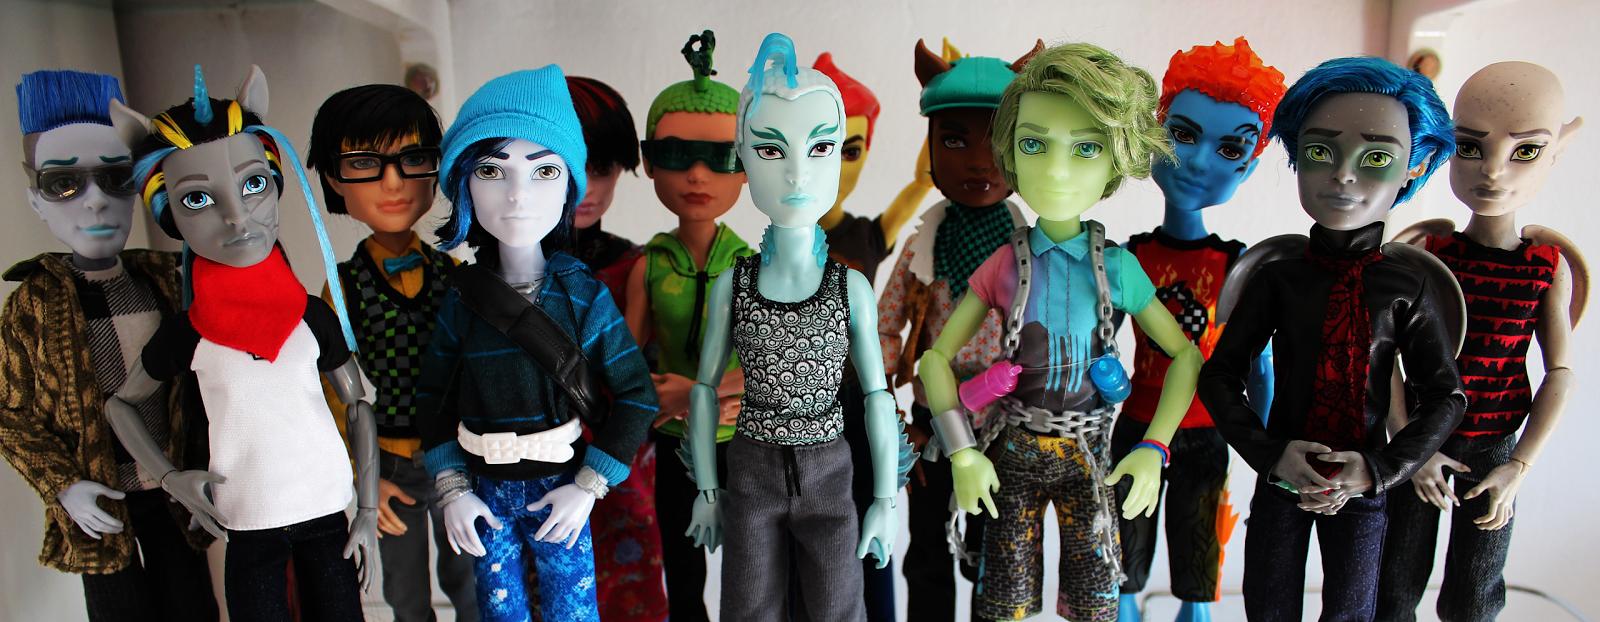 Karlota  Monster High Dolls Mi coleccin de chicos